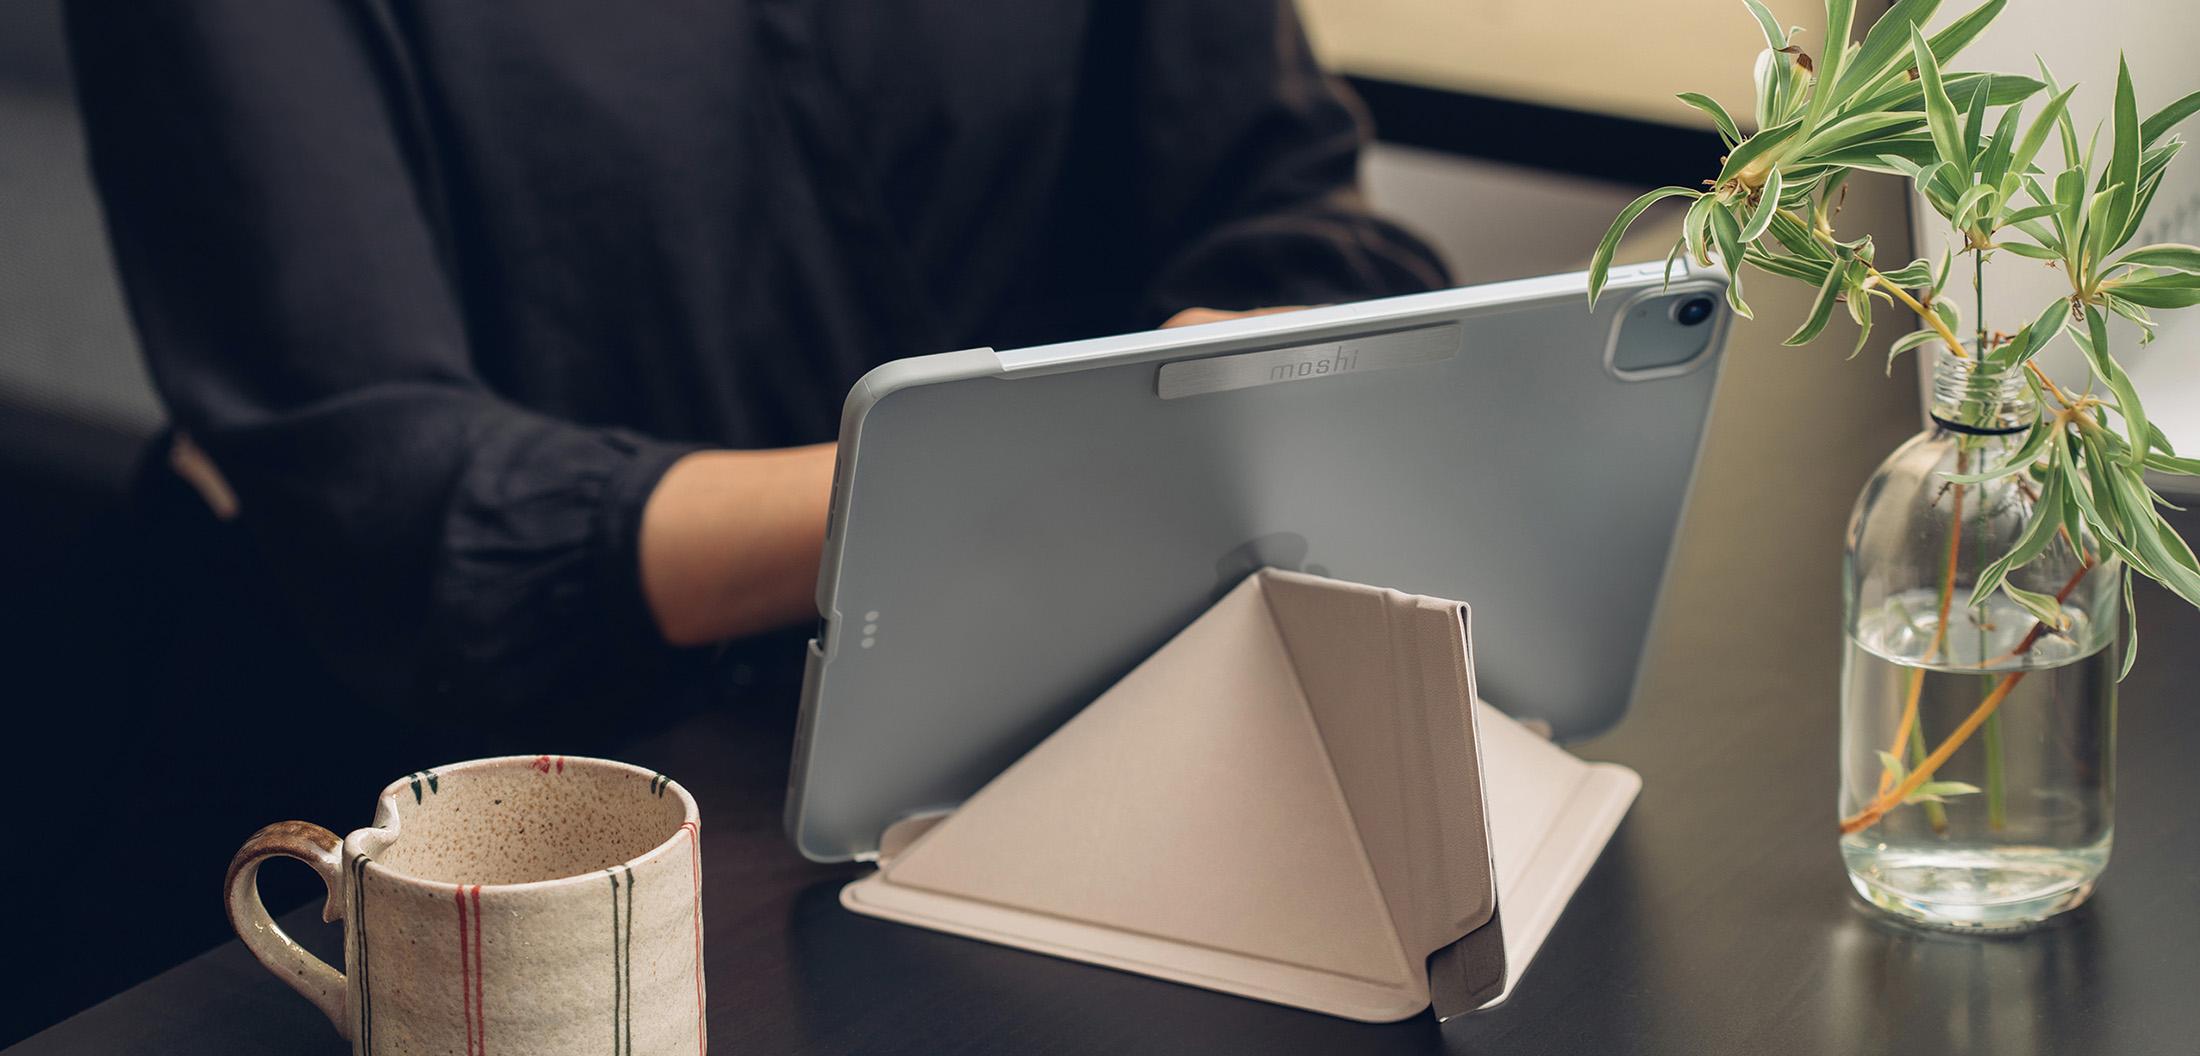 Moshi.xZДля новых iPad Air 10,9